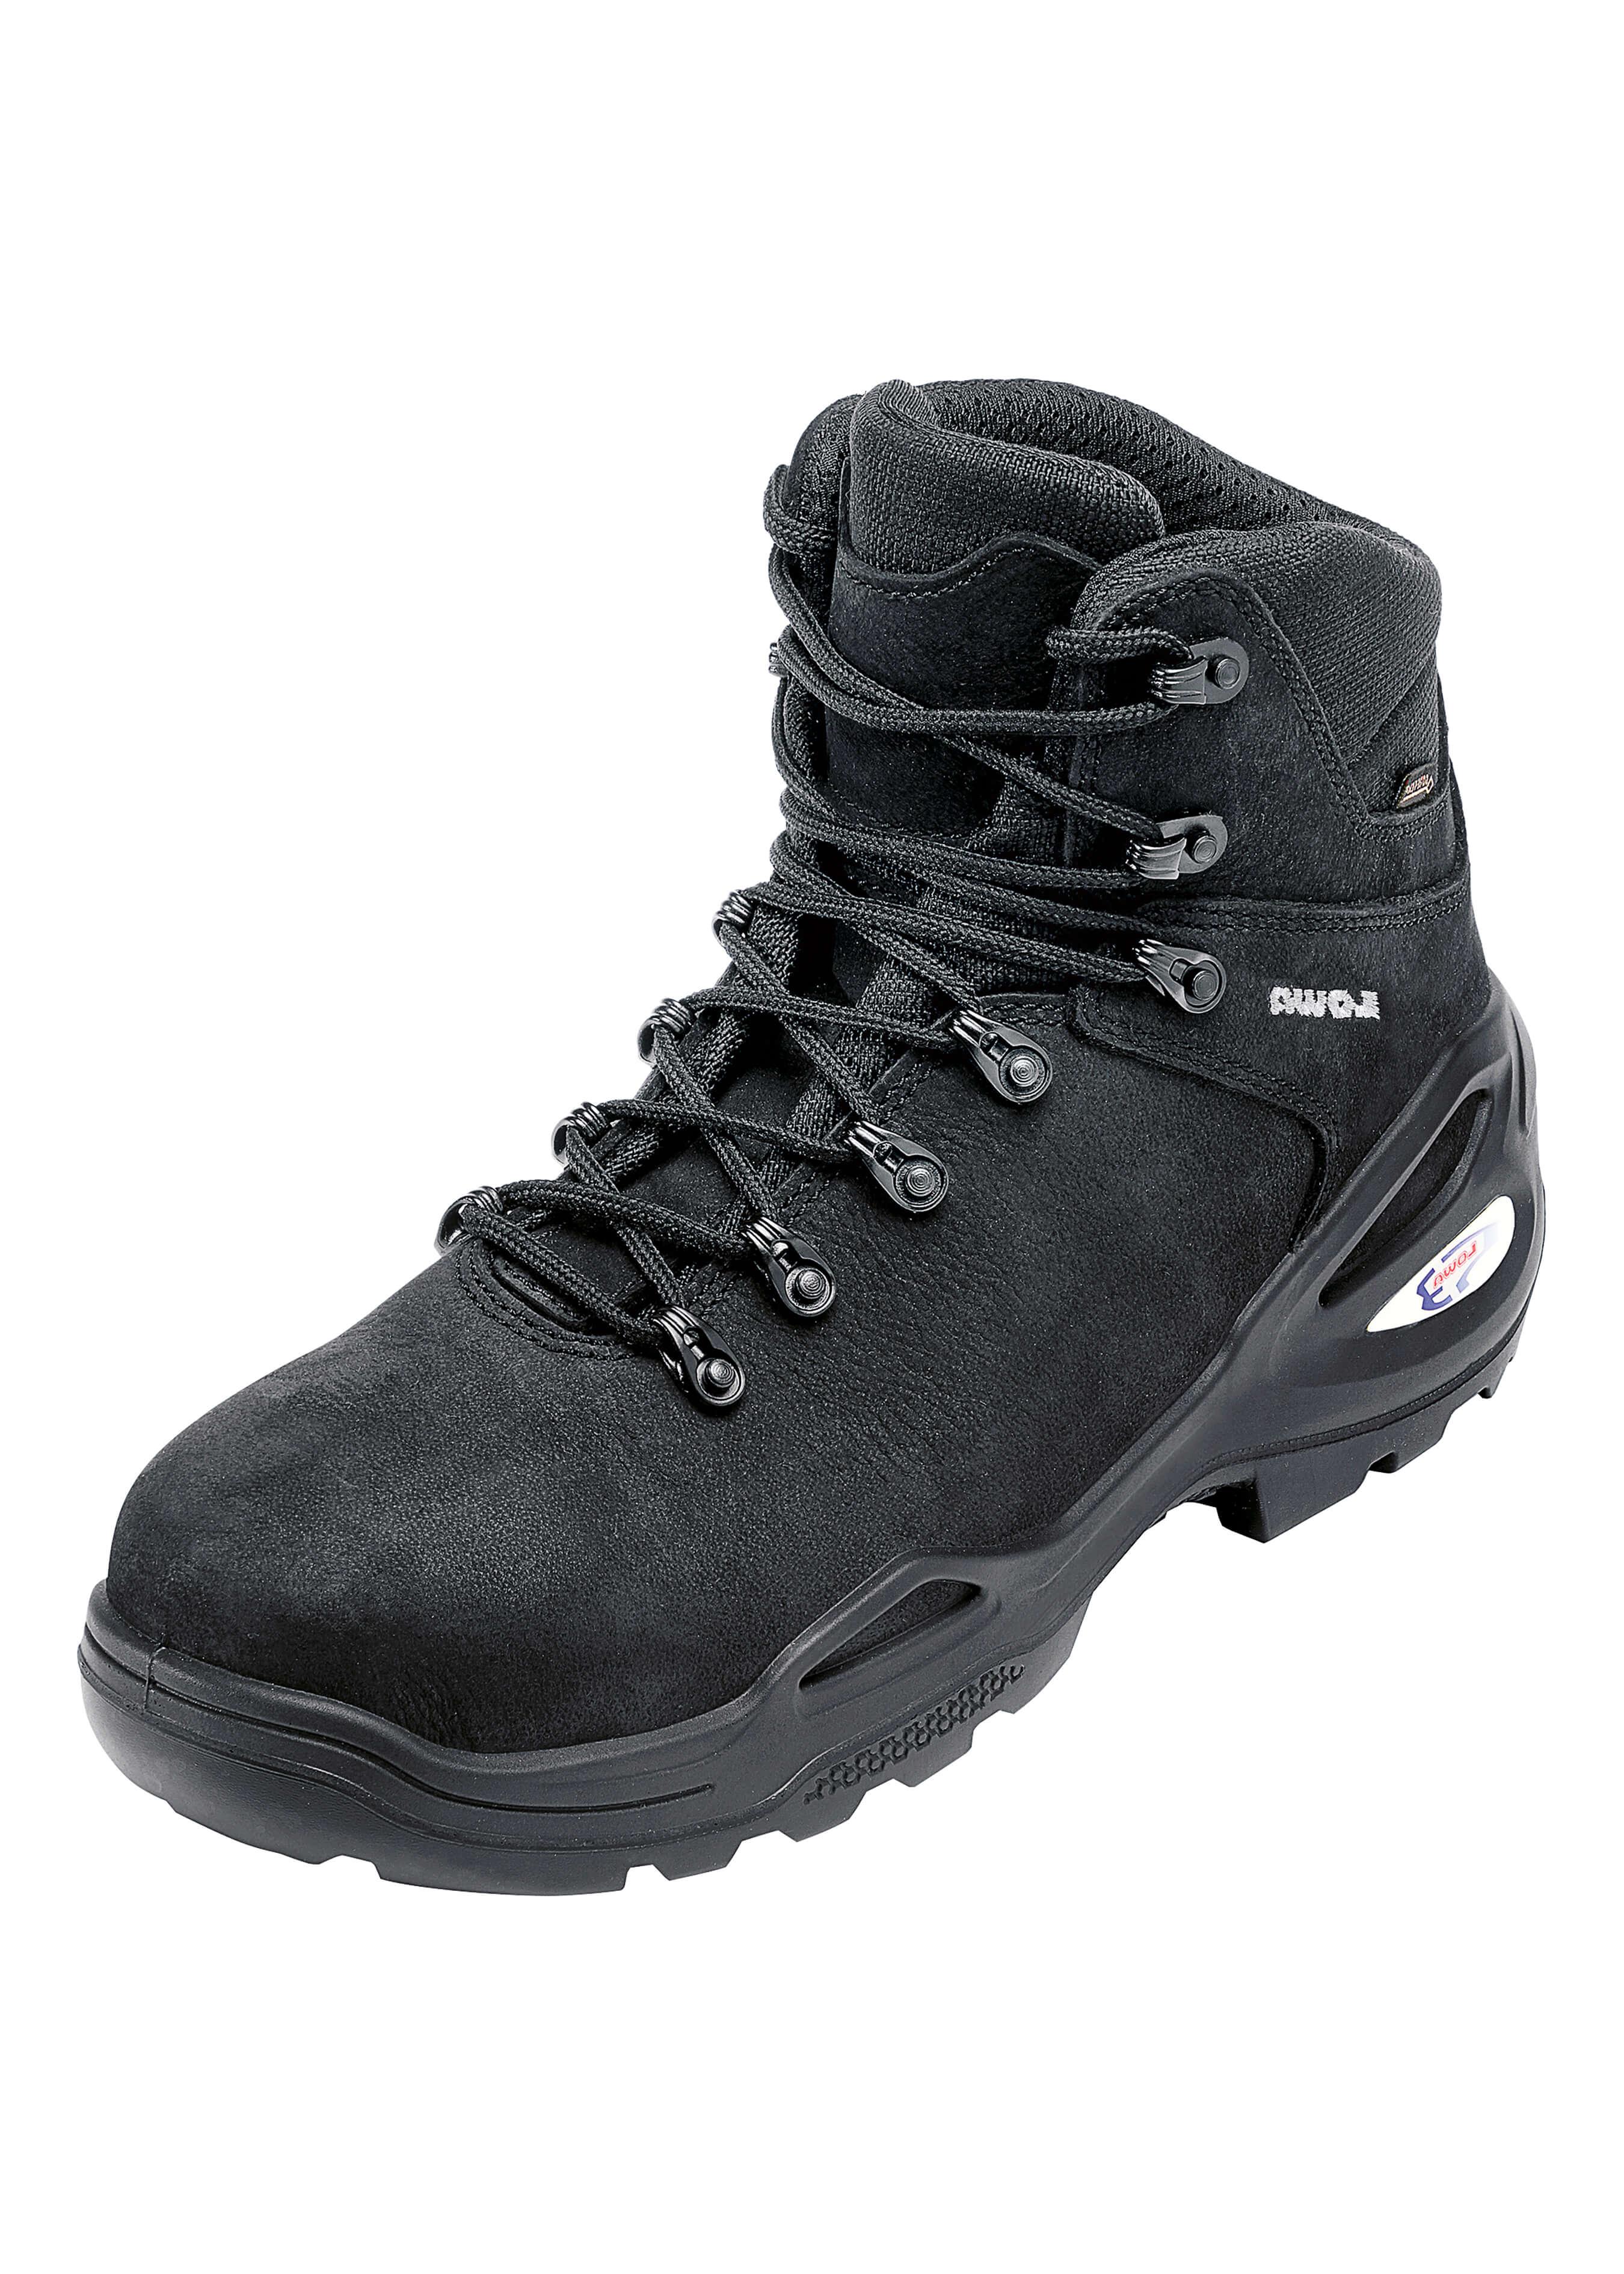 Chaussure de sécurité Phantom Work S3 41451036 1